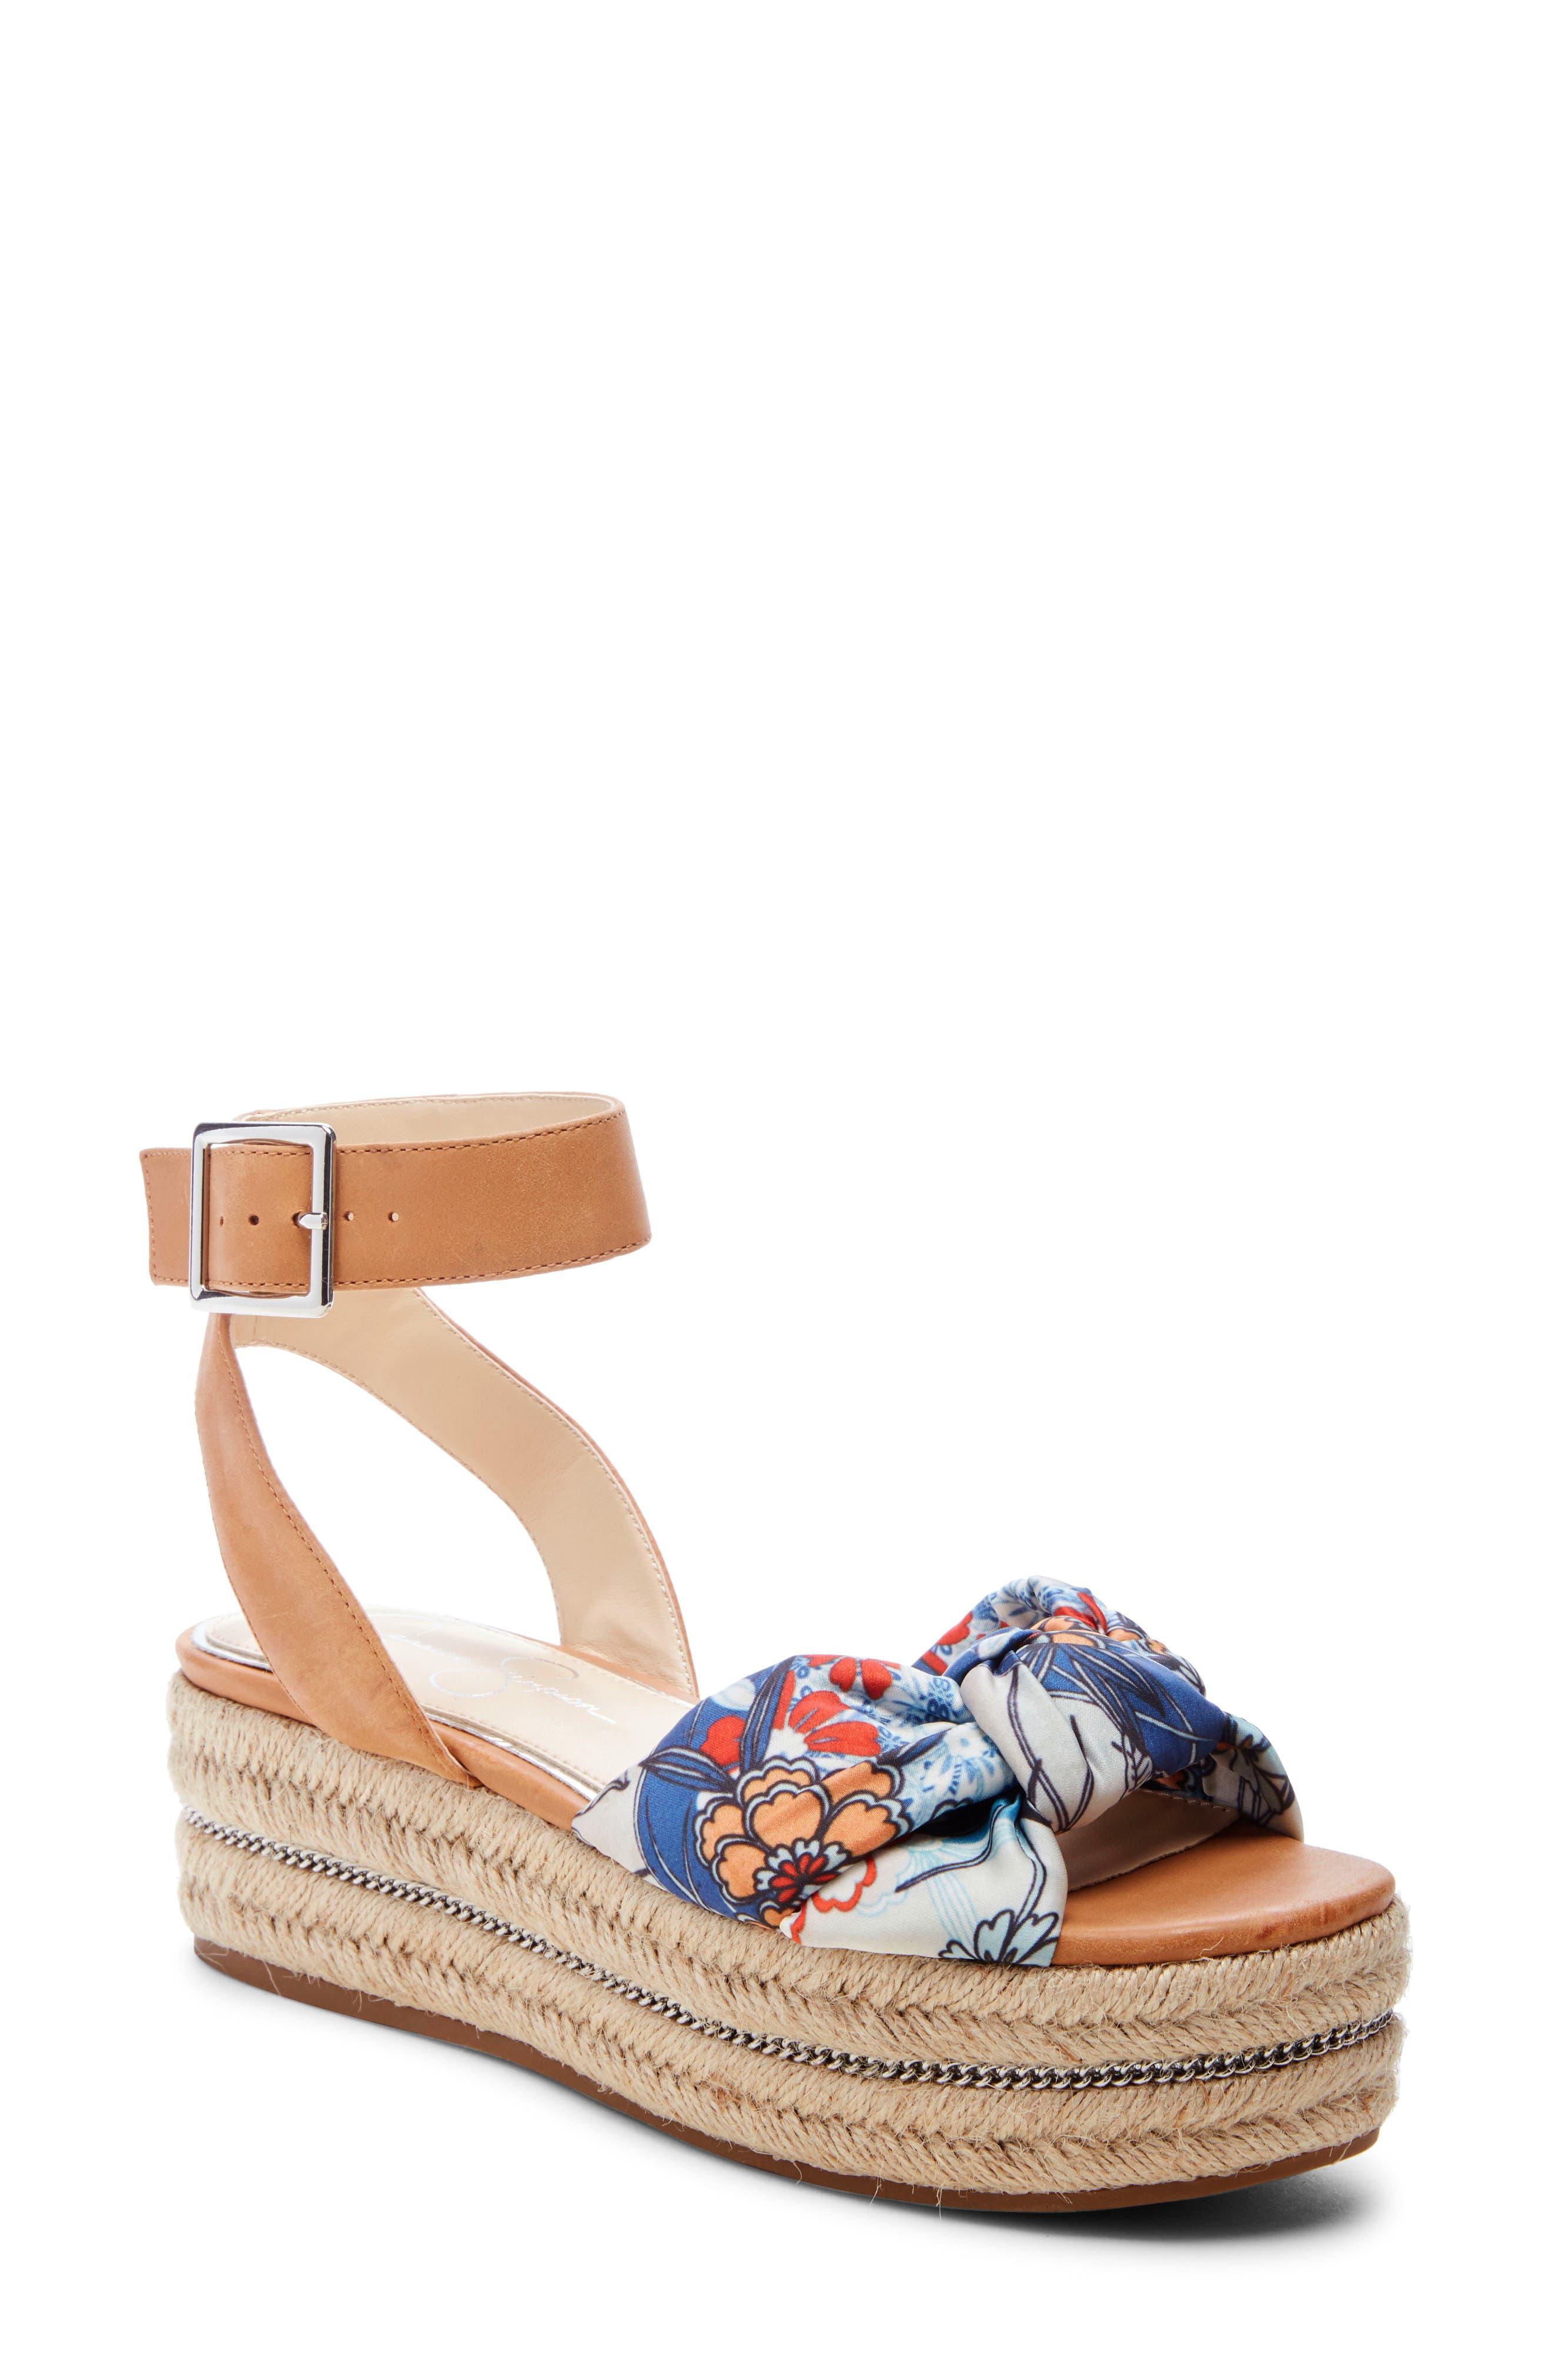 Jessica Simpson Aprille Platform Ankle Strap Sandal, Blue